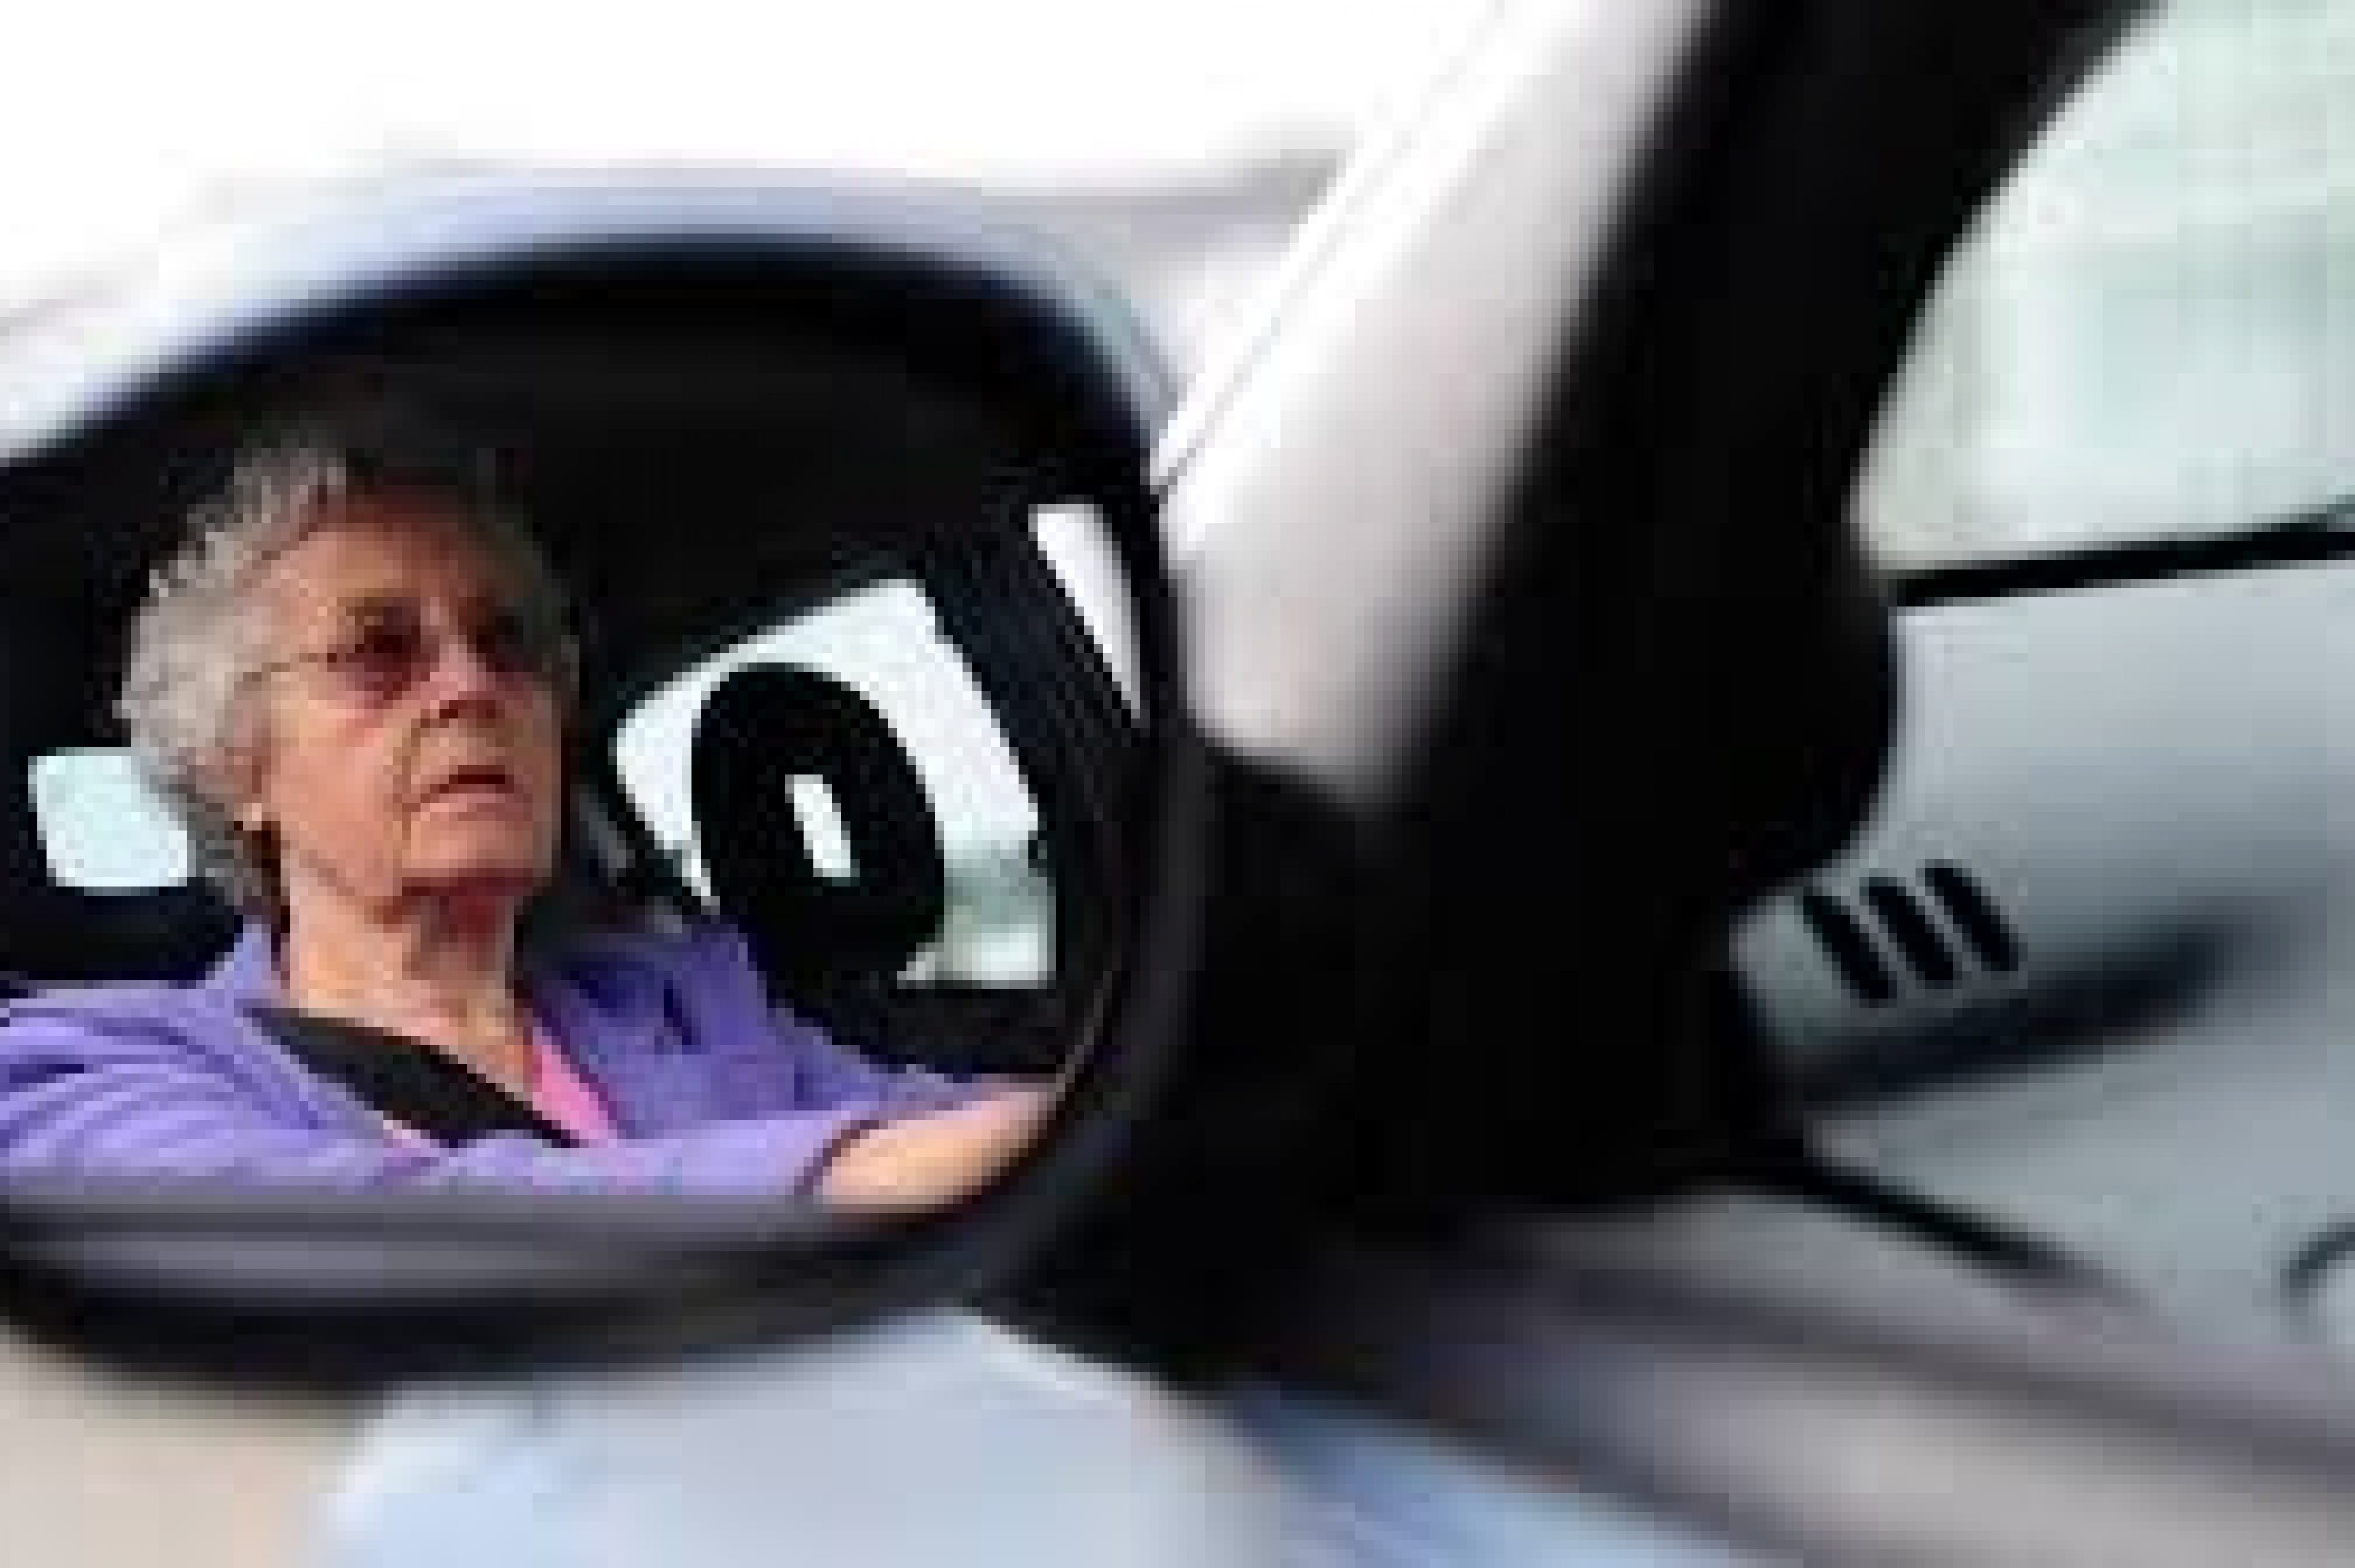 Fahrtraining ab 65 Jahren